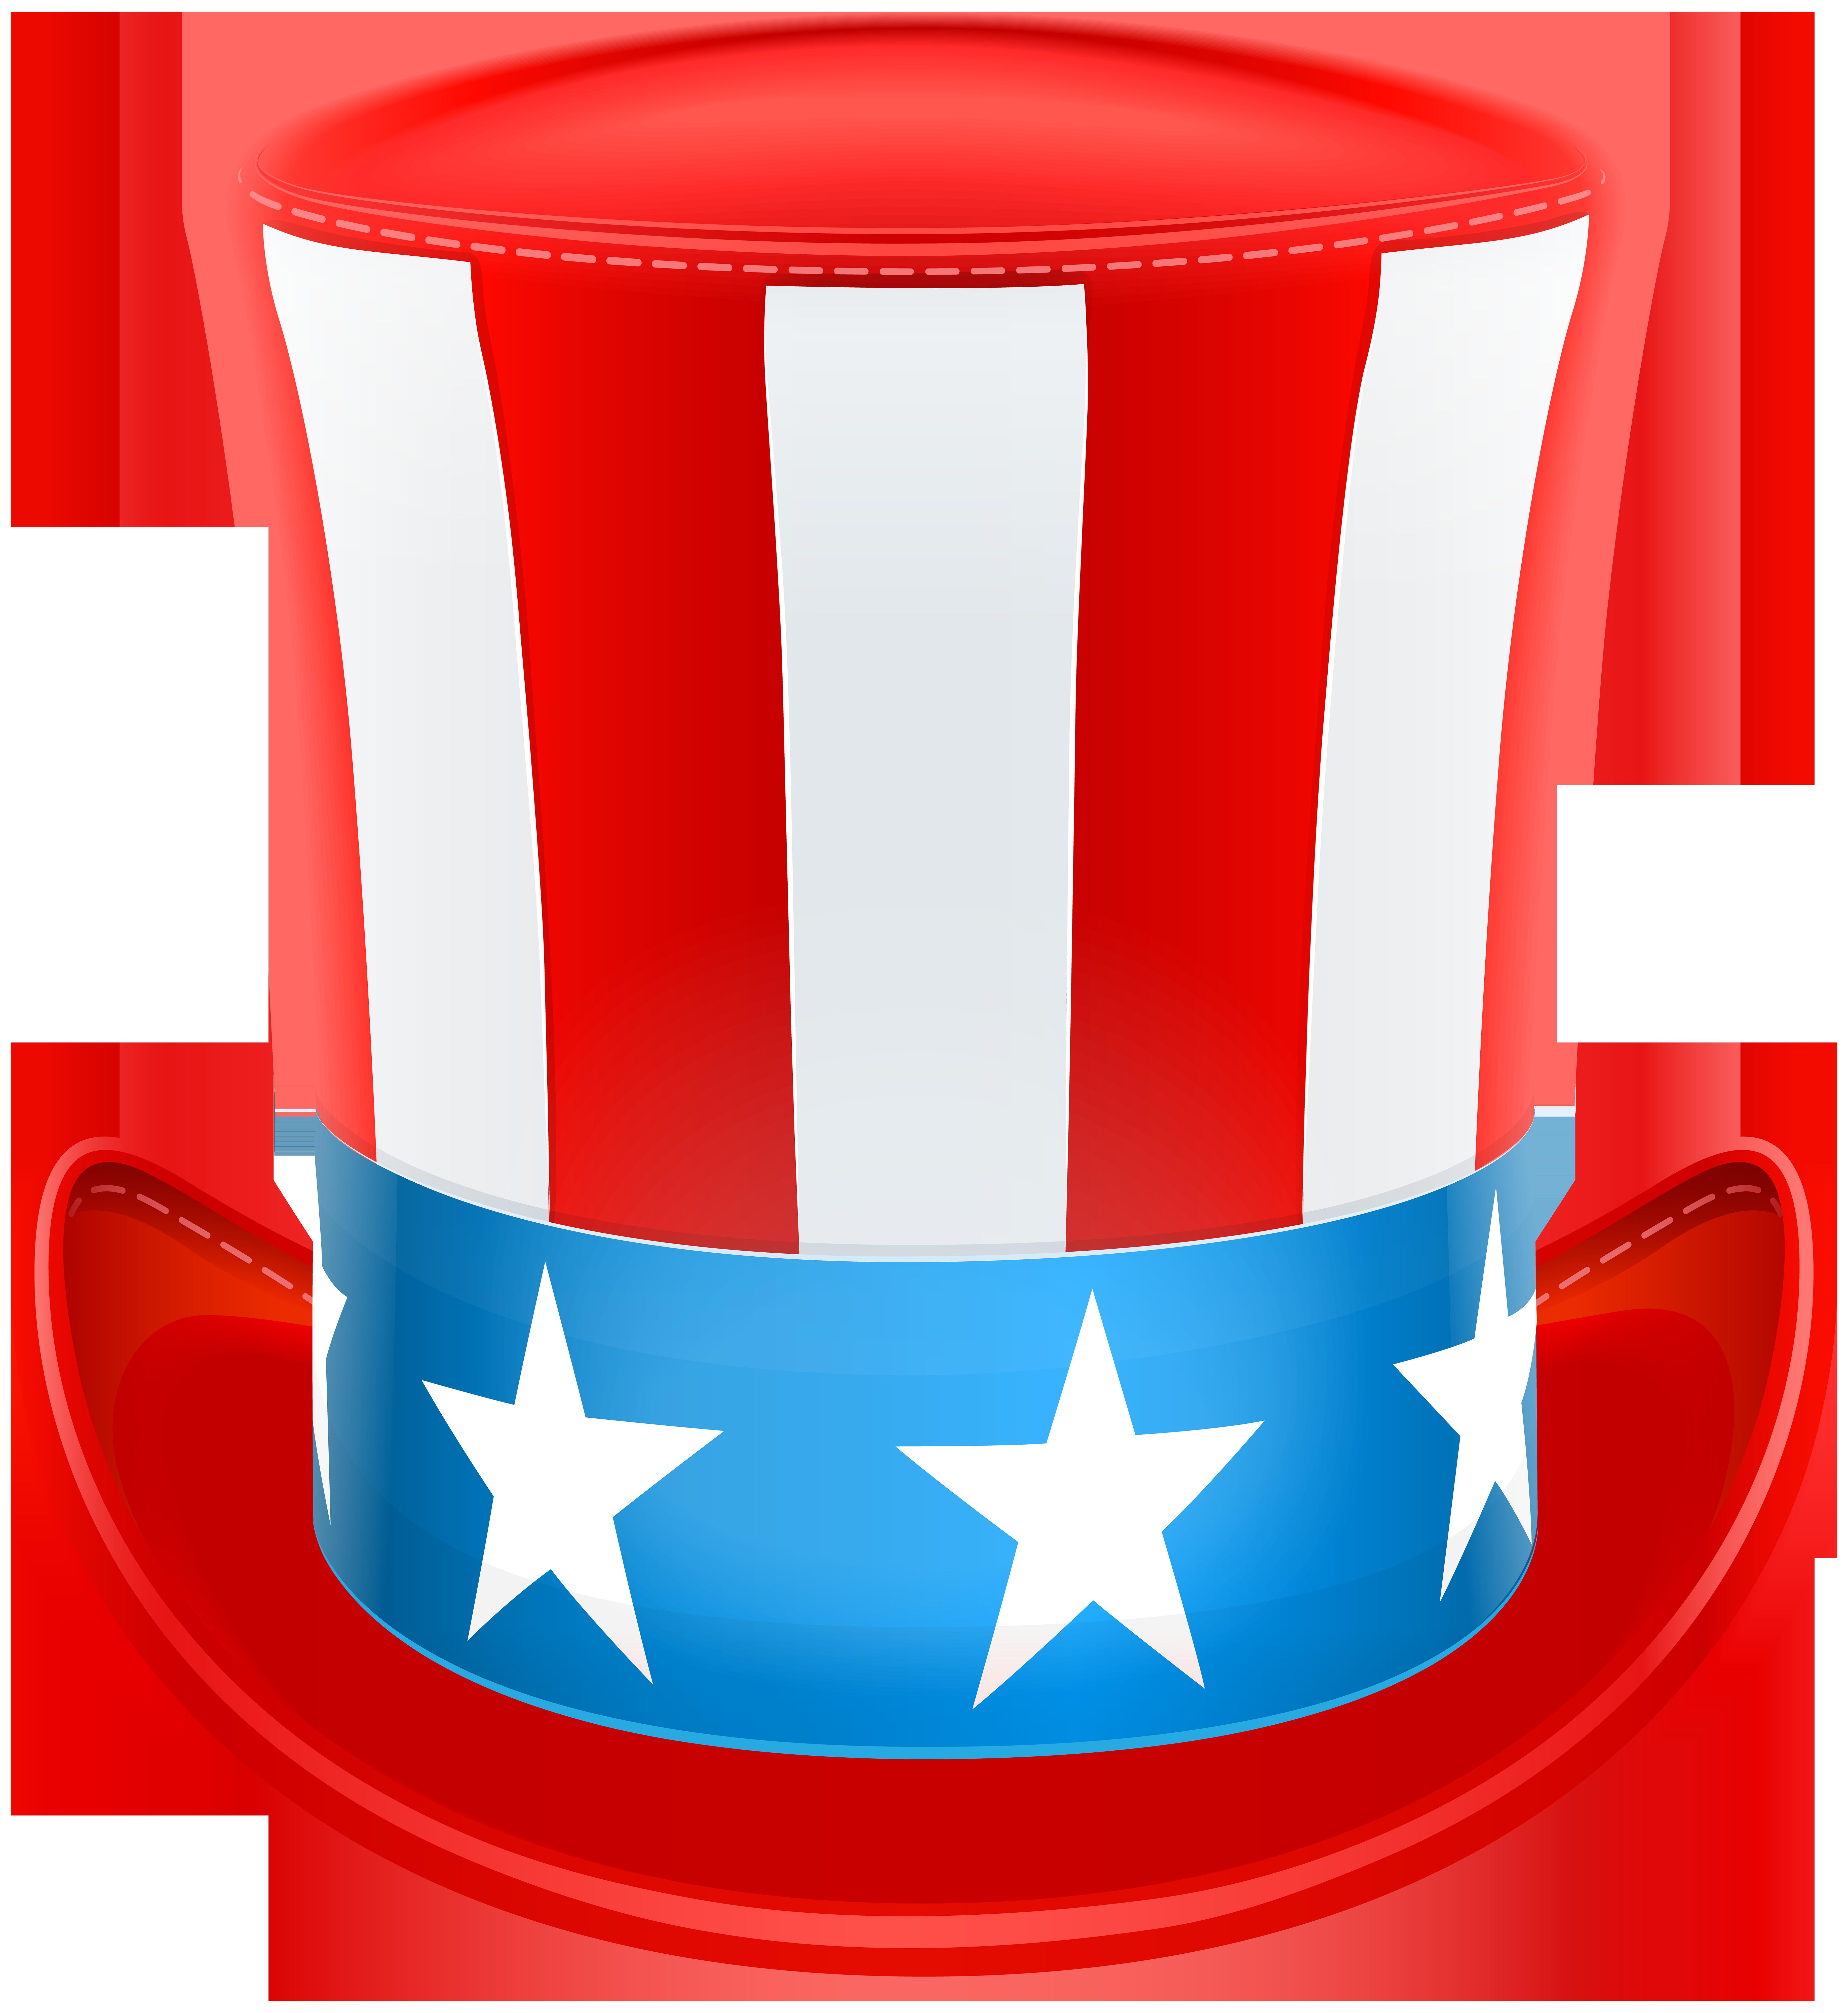 Patriotic clipart free clip art. Usa hat png image